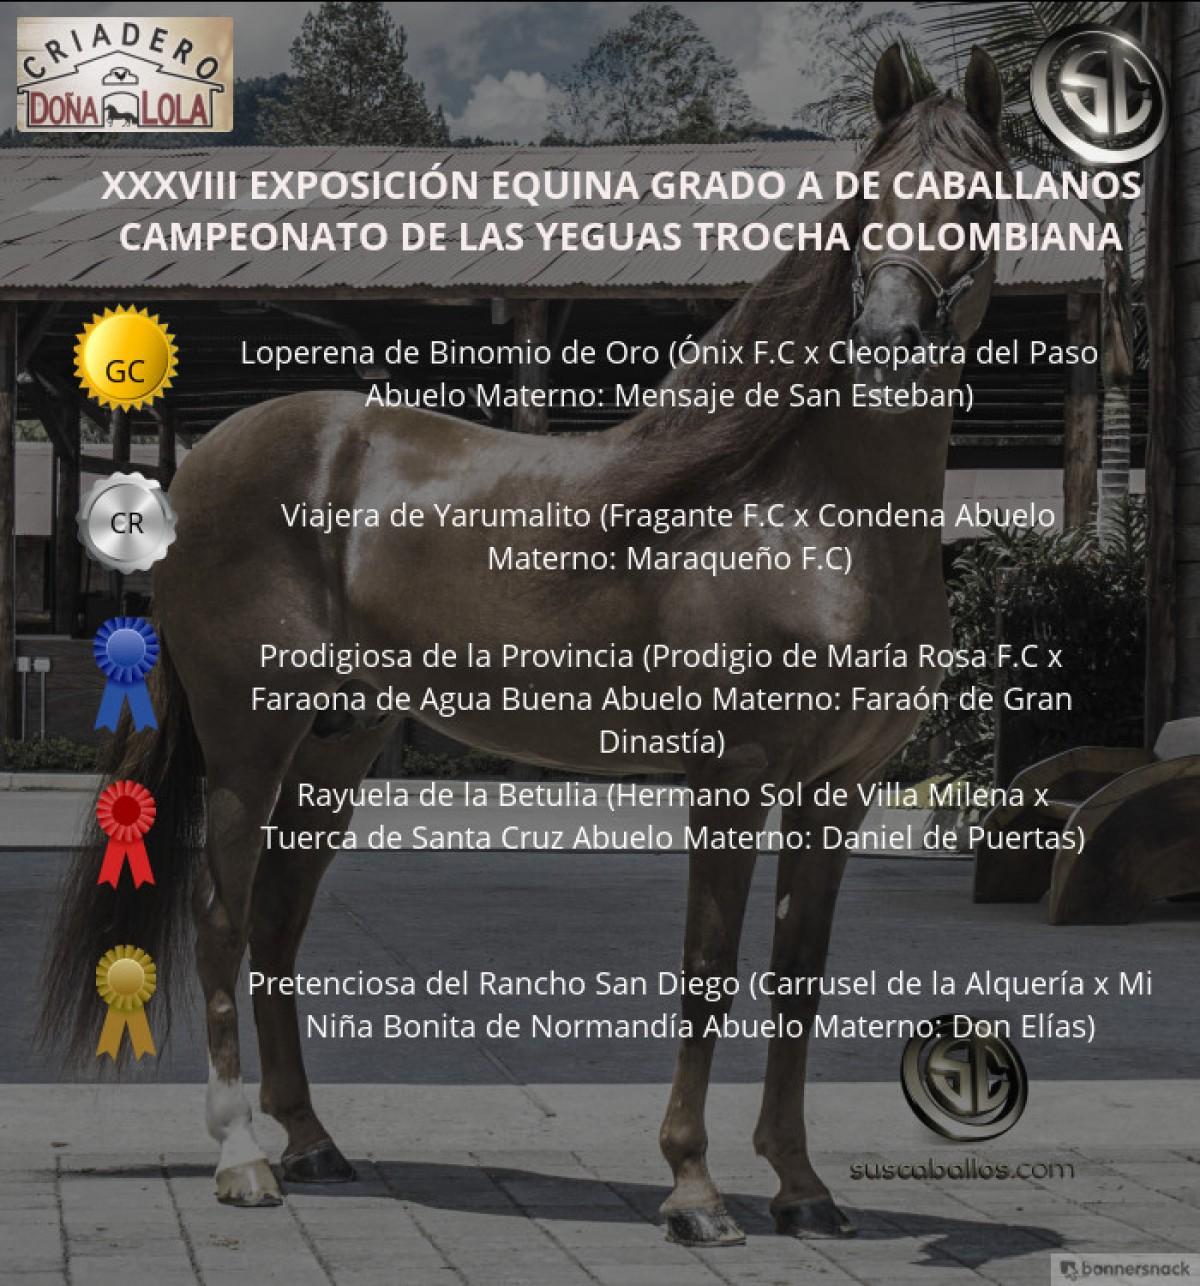 VÍDEO: Loperena Campeona, Viajera Reservada, Trocha Colombiana, Caballanos 2018